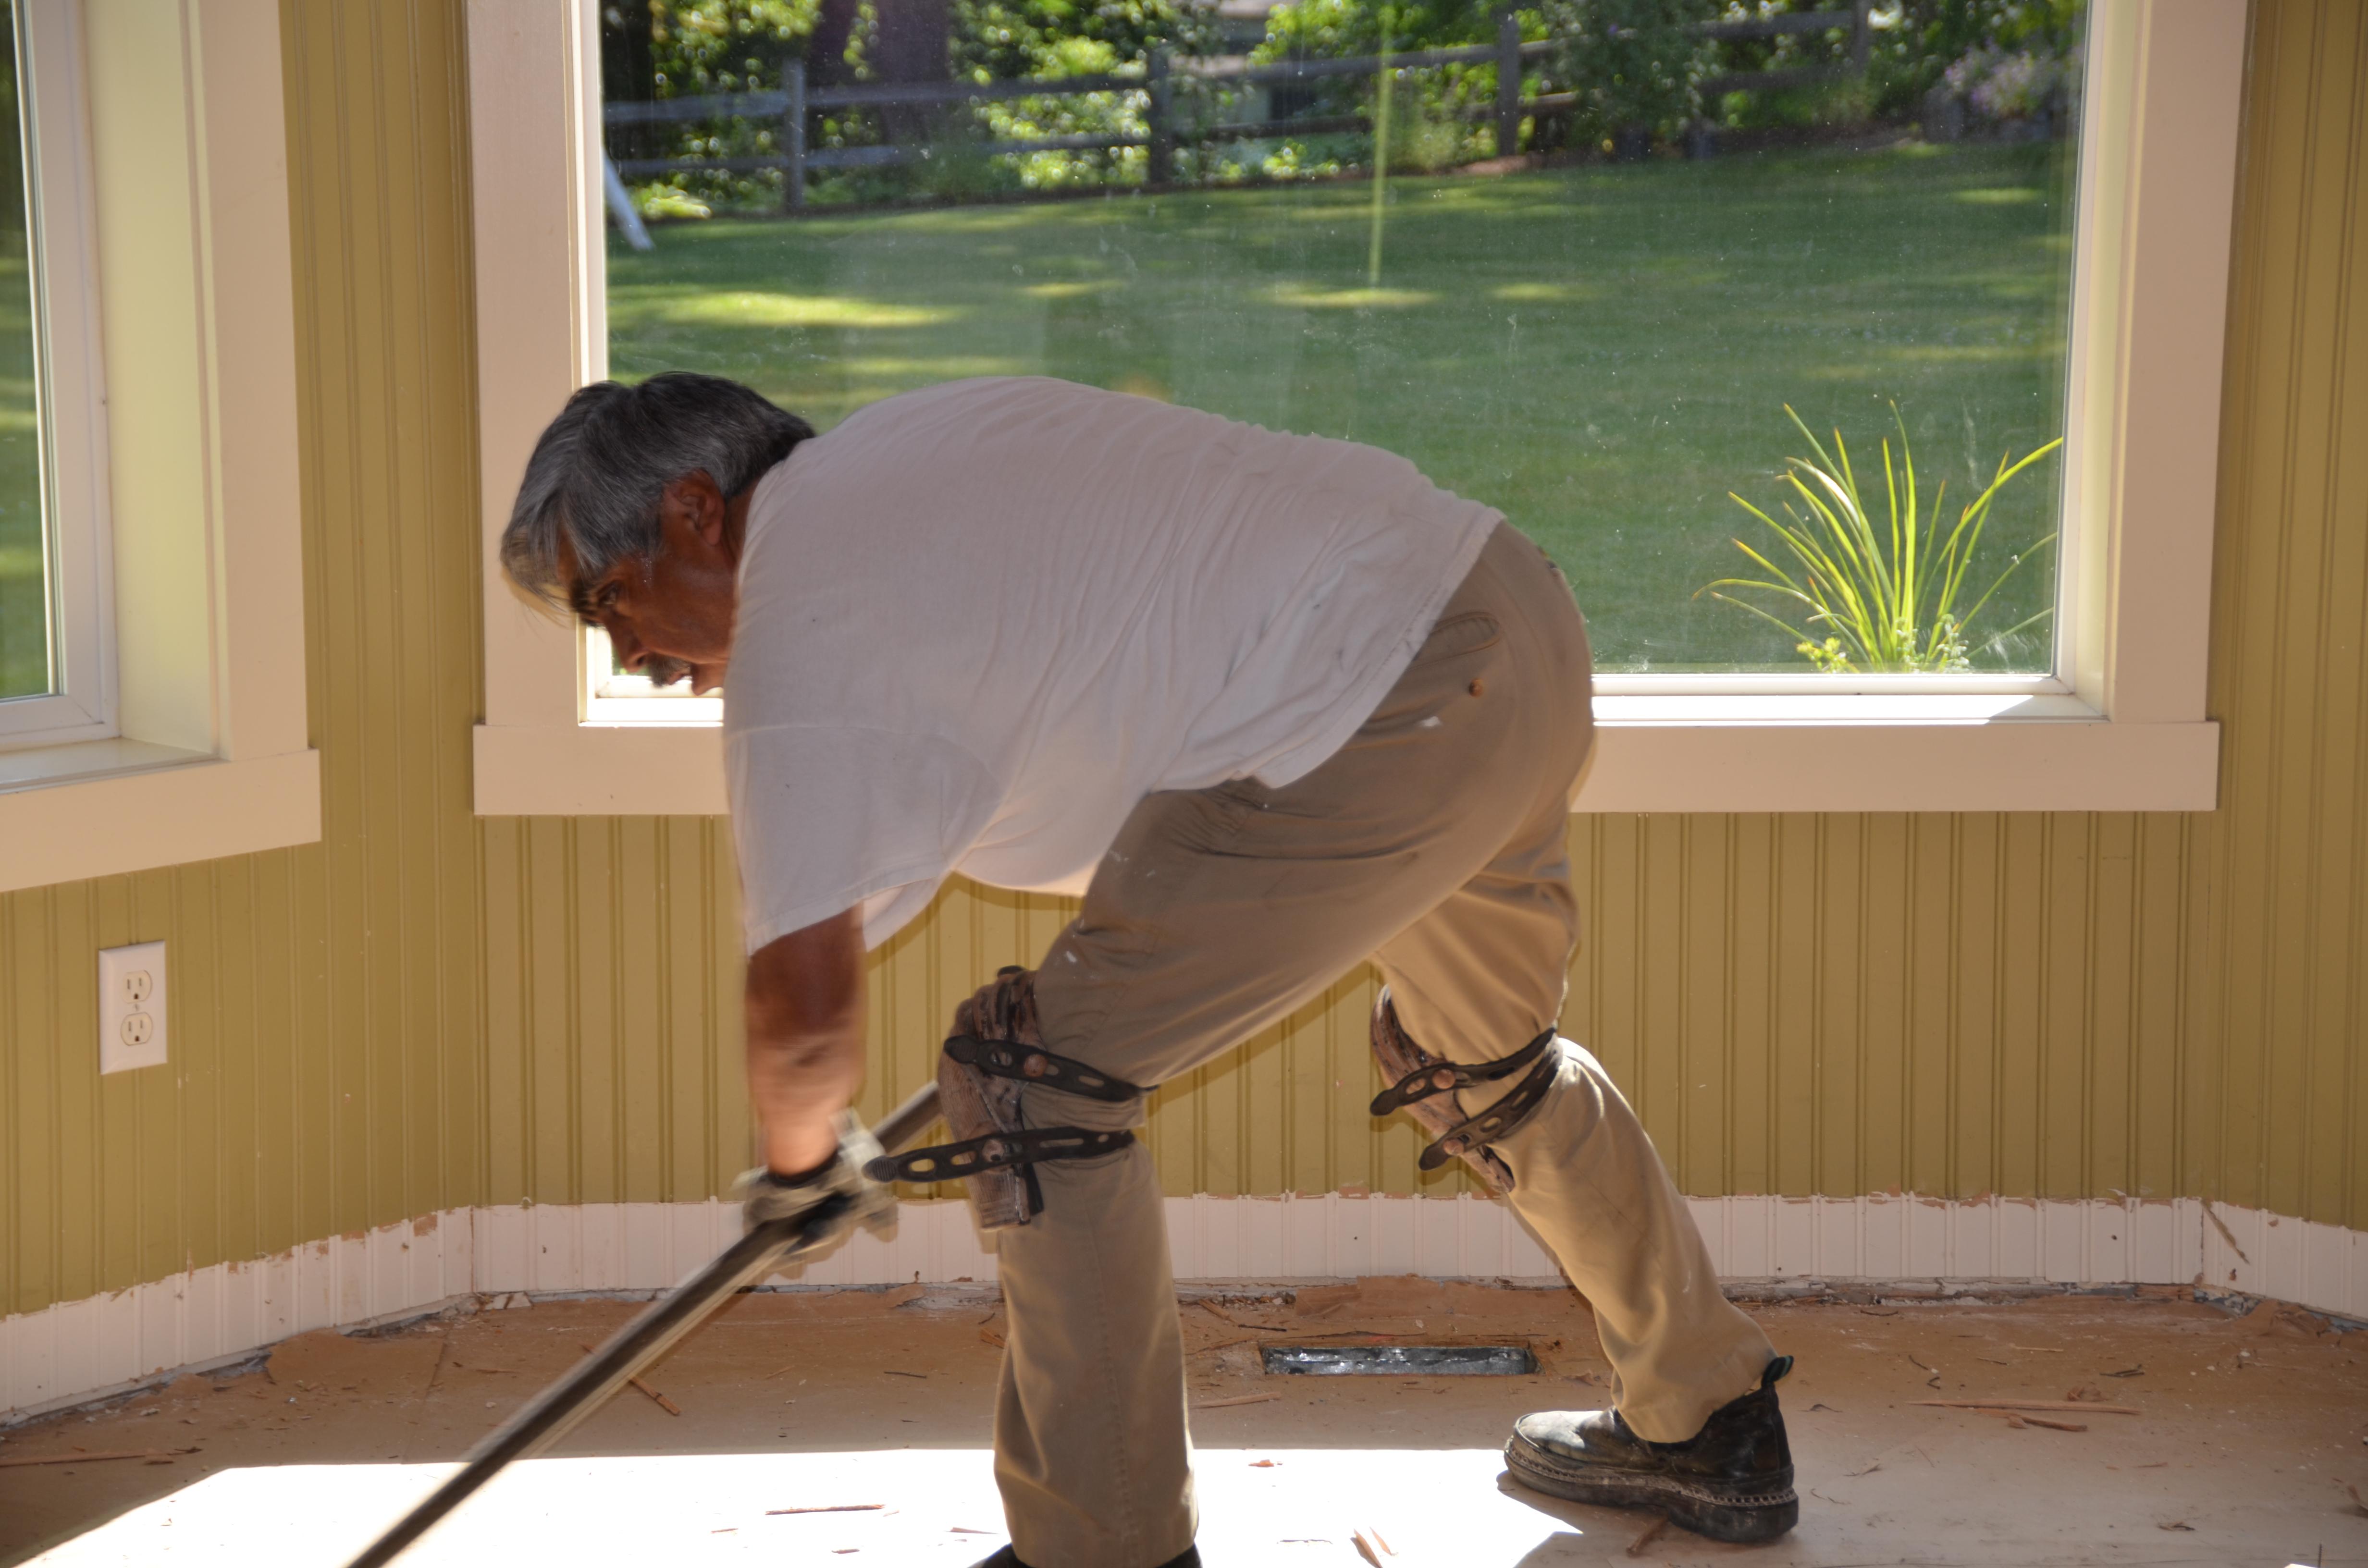 Francisco removing damaged flooring